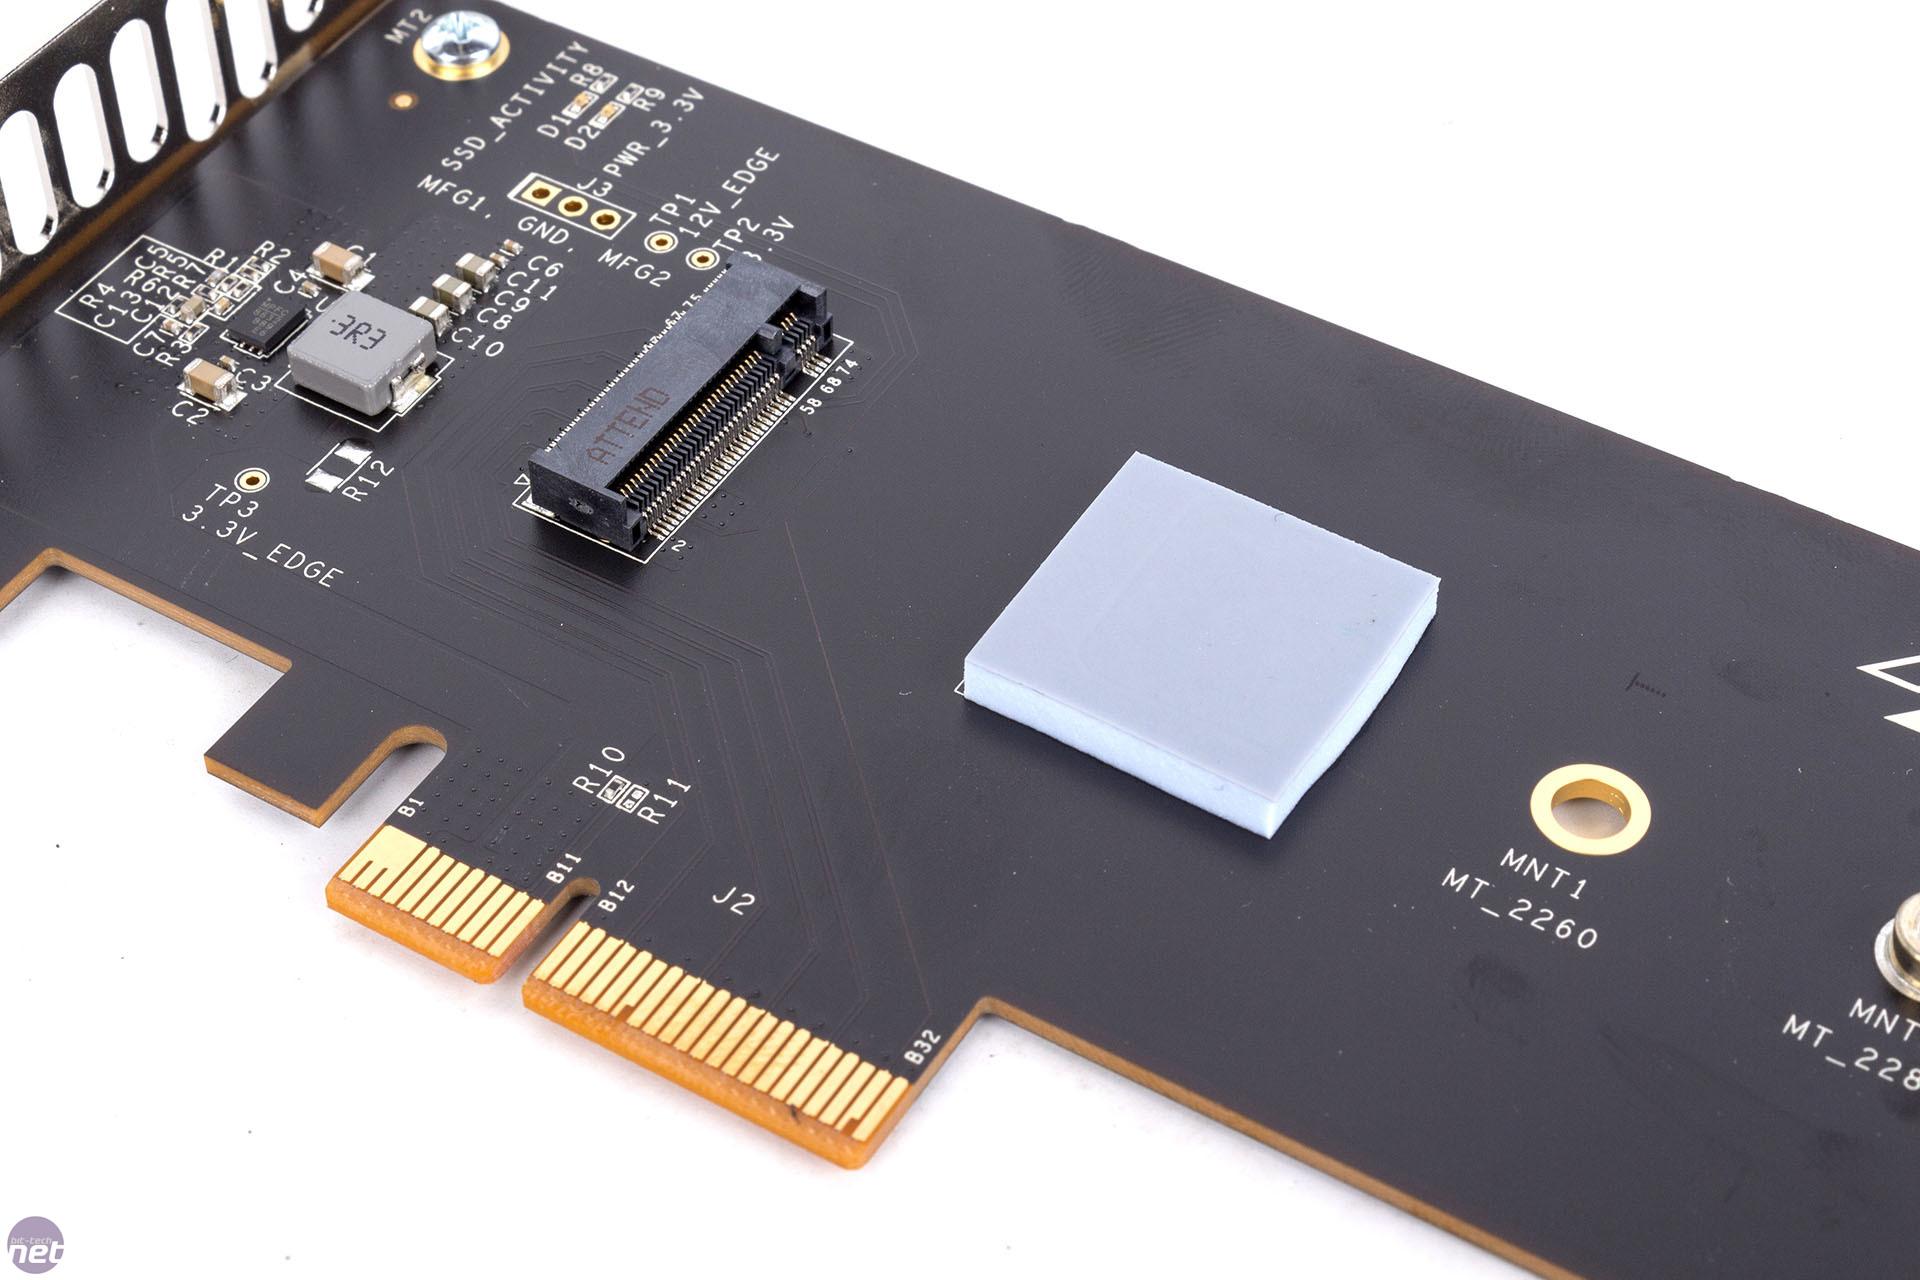 Toshiba ocz rd400 review 512gb bit tech toshiba ocz rd400 review 512gb falaconquin